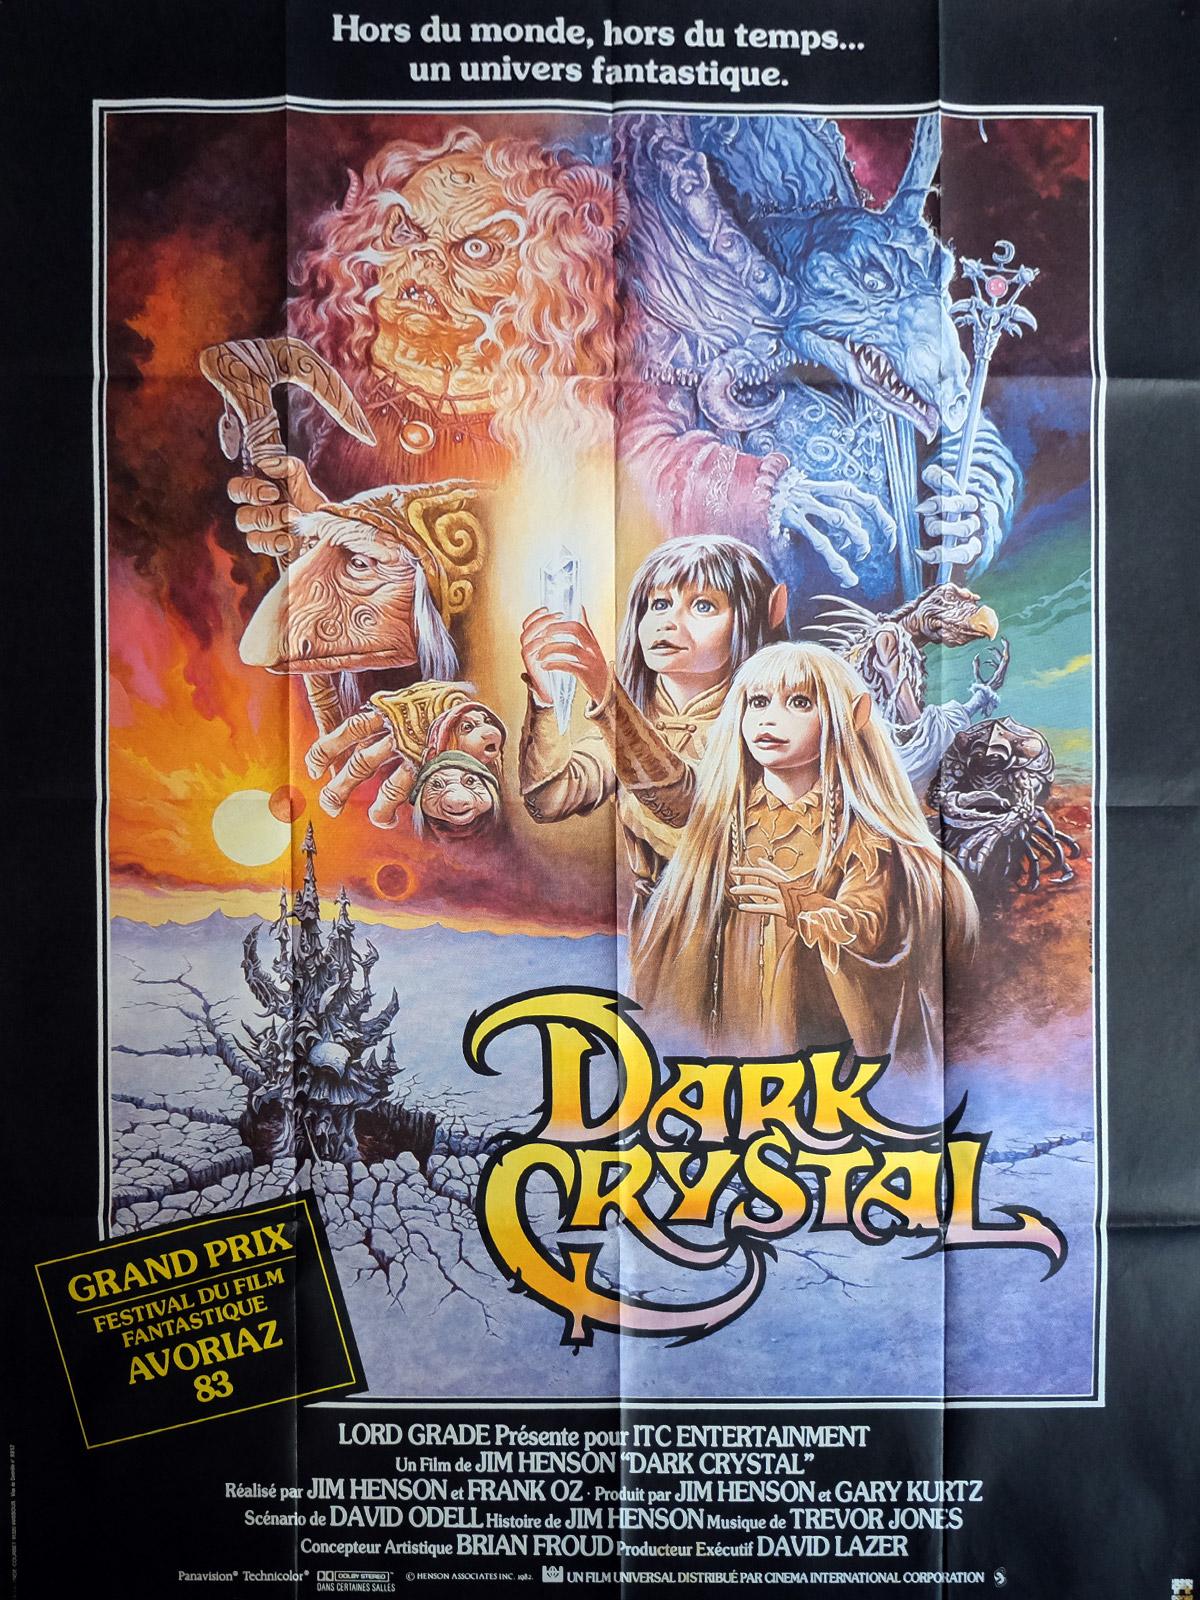 dark-crystal-affiche-120x160-fr-81-jim-h